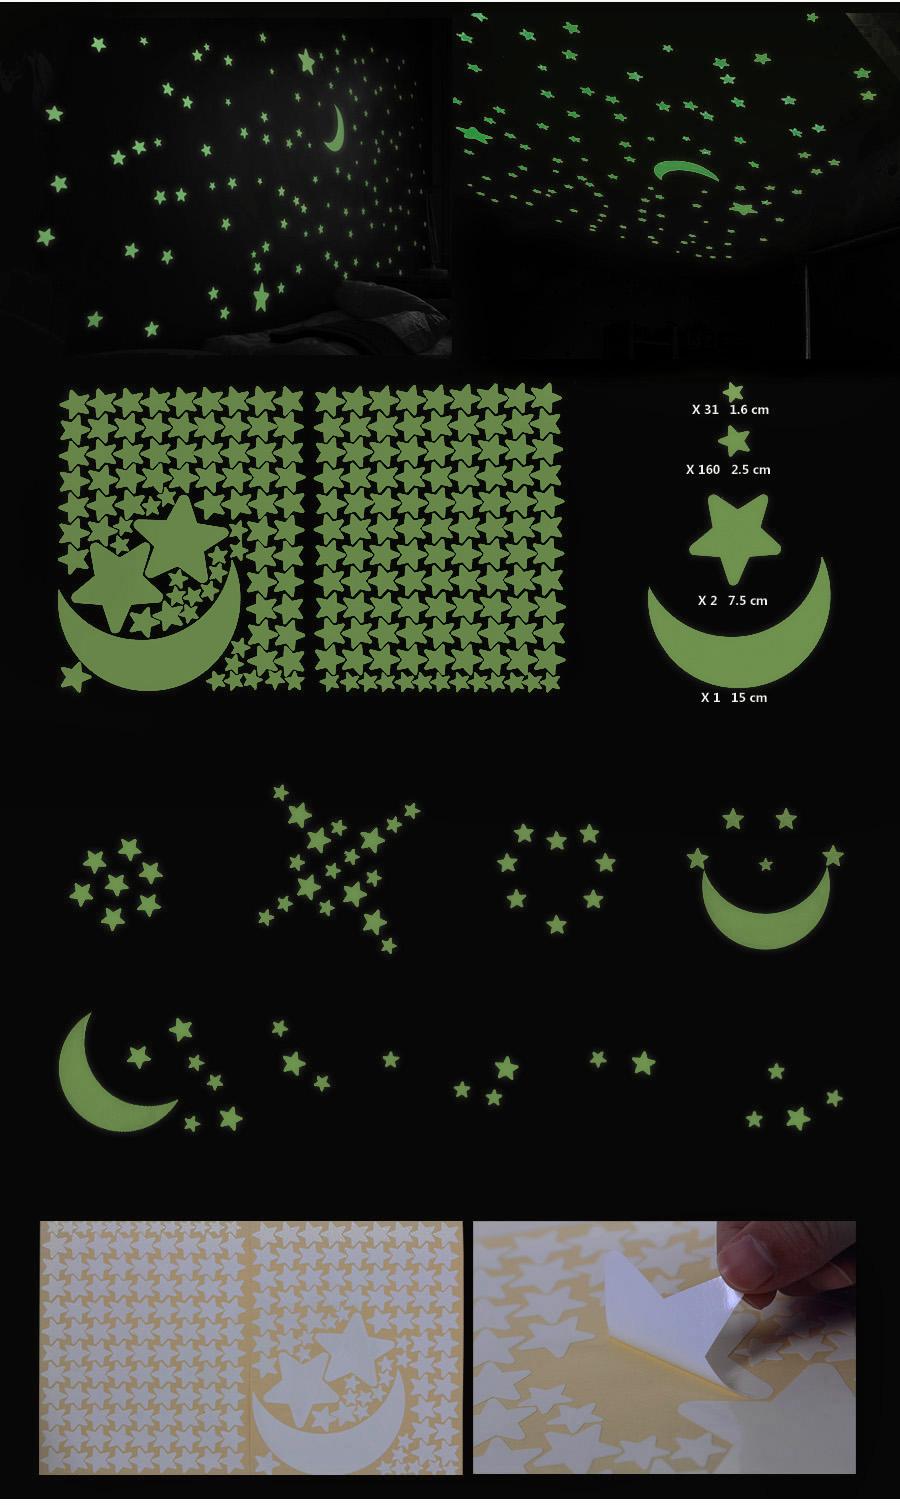 wandtattoo 1 mond 193 st ck sterne fluoreszierend sternenhimmel leuchten fwt93y ebay. Black Bedroom Furniture Sets. Home Design Ideas